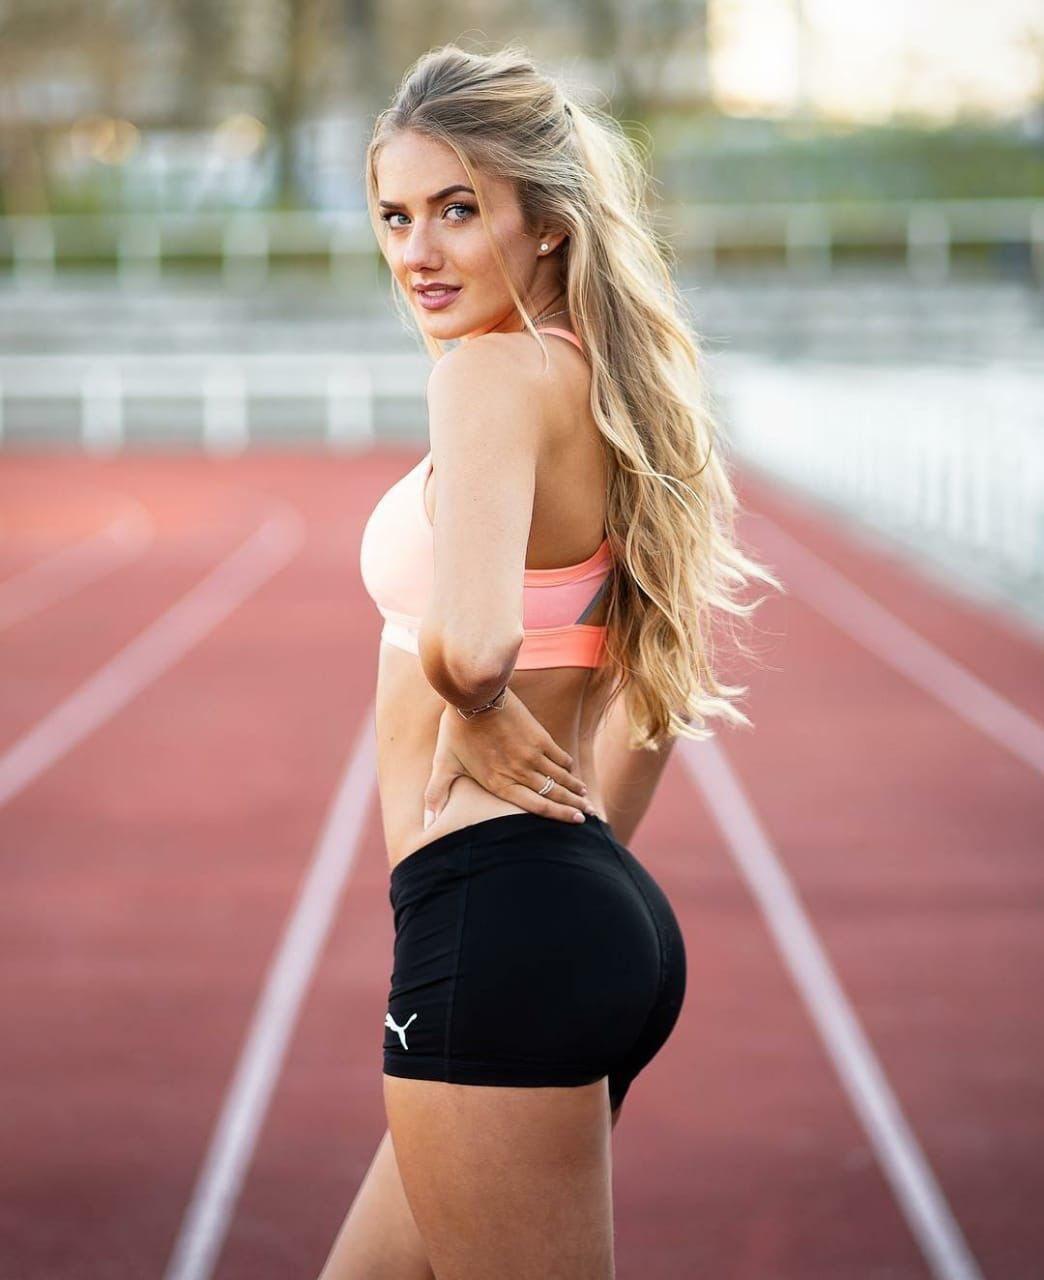 Borussia Dortmund Fitness Trainer Alica Schmidt Inkhel Com